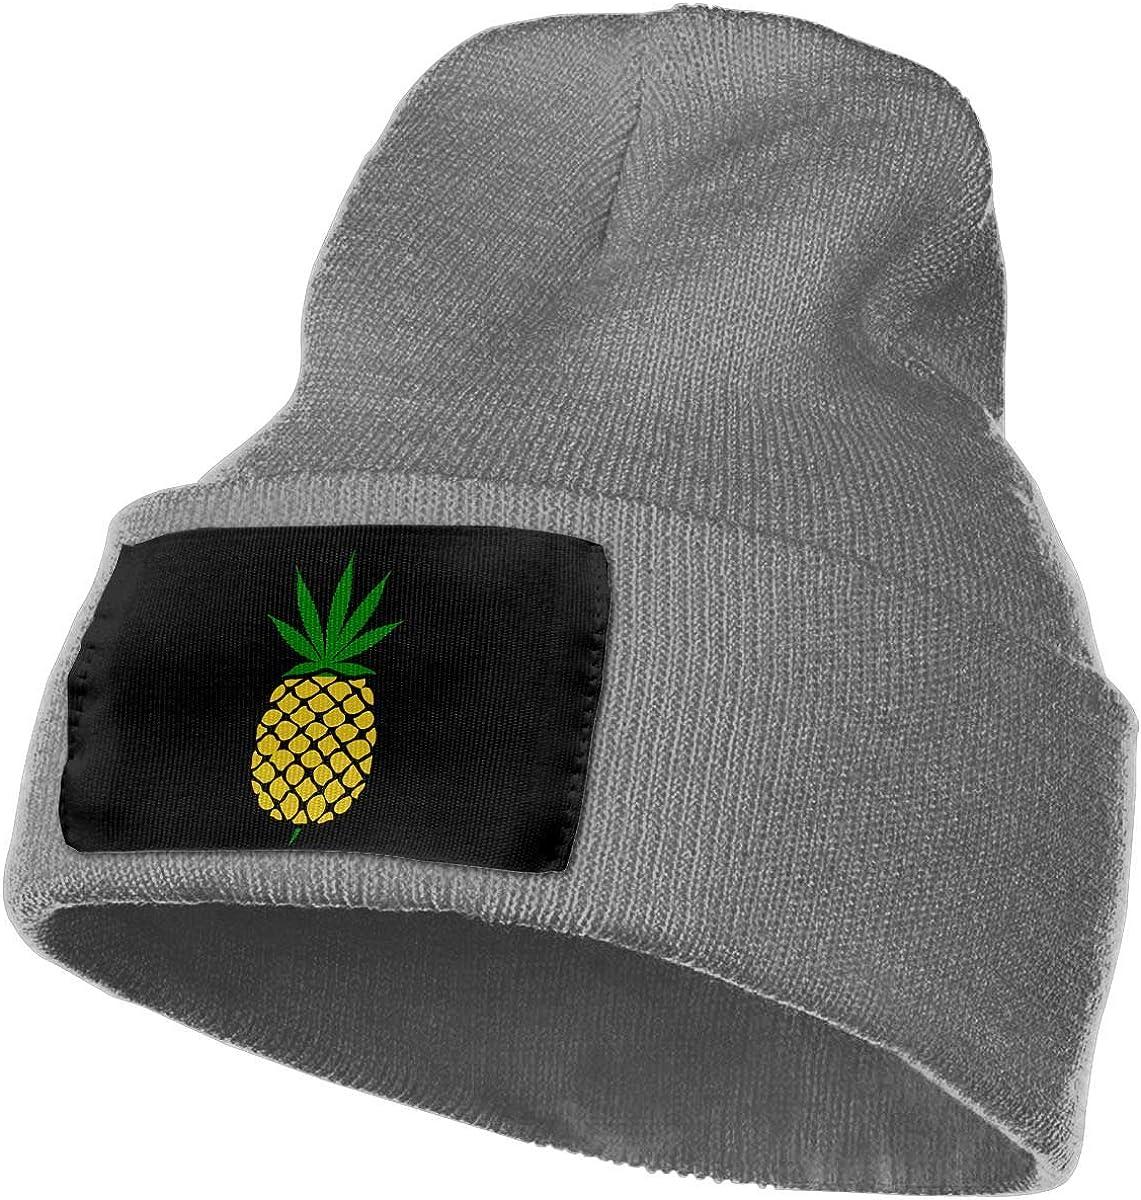 COLLJL-8 Men//Women Nigerian Flag Outdoor Warm Knit Beanies Hat Soft Winter Skull Caps